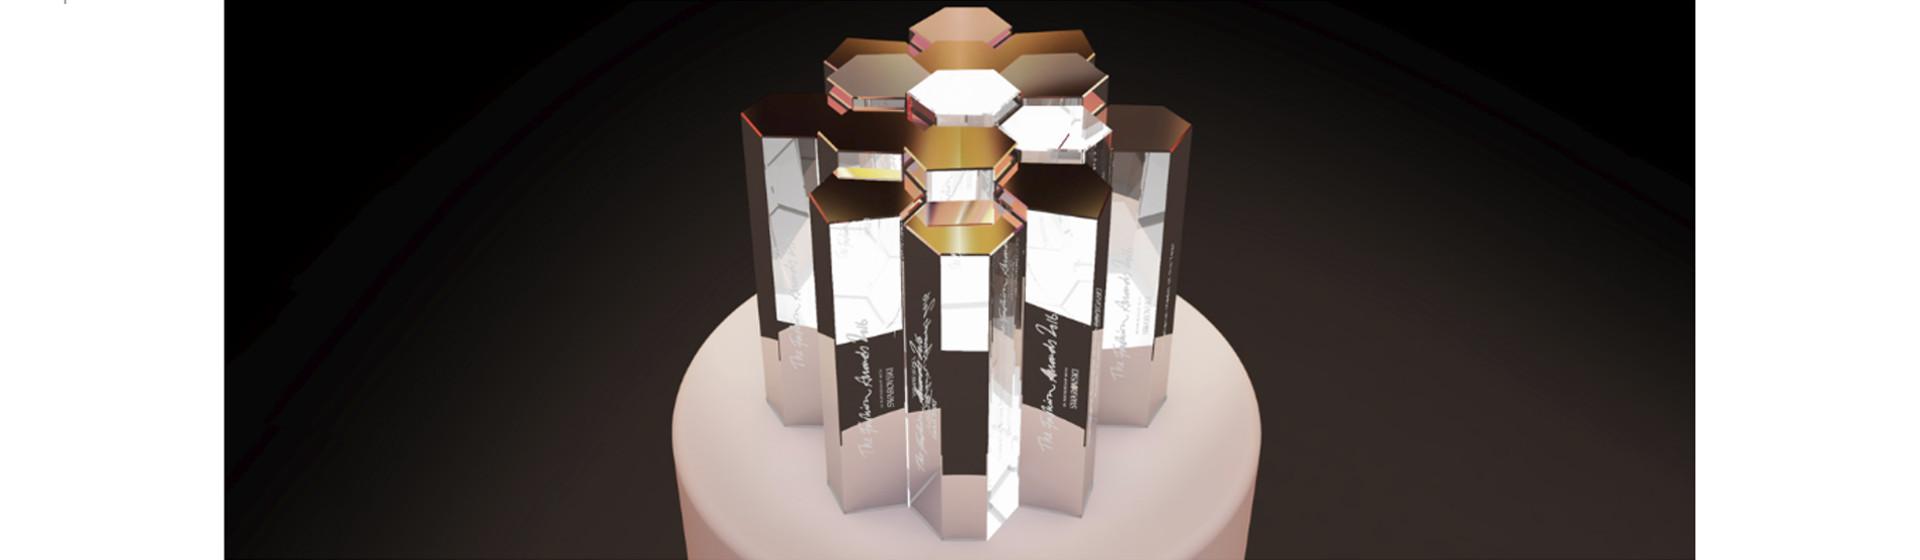 Marc Newson of Swarovski to Design Trophy for The Fashion Awards 2016